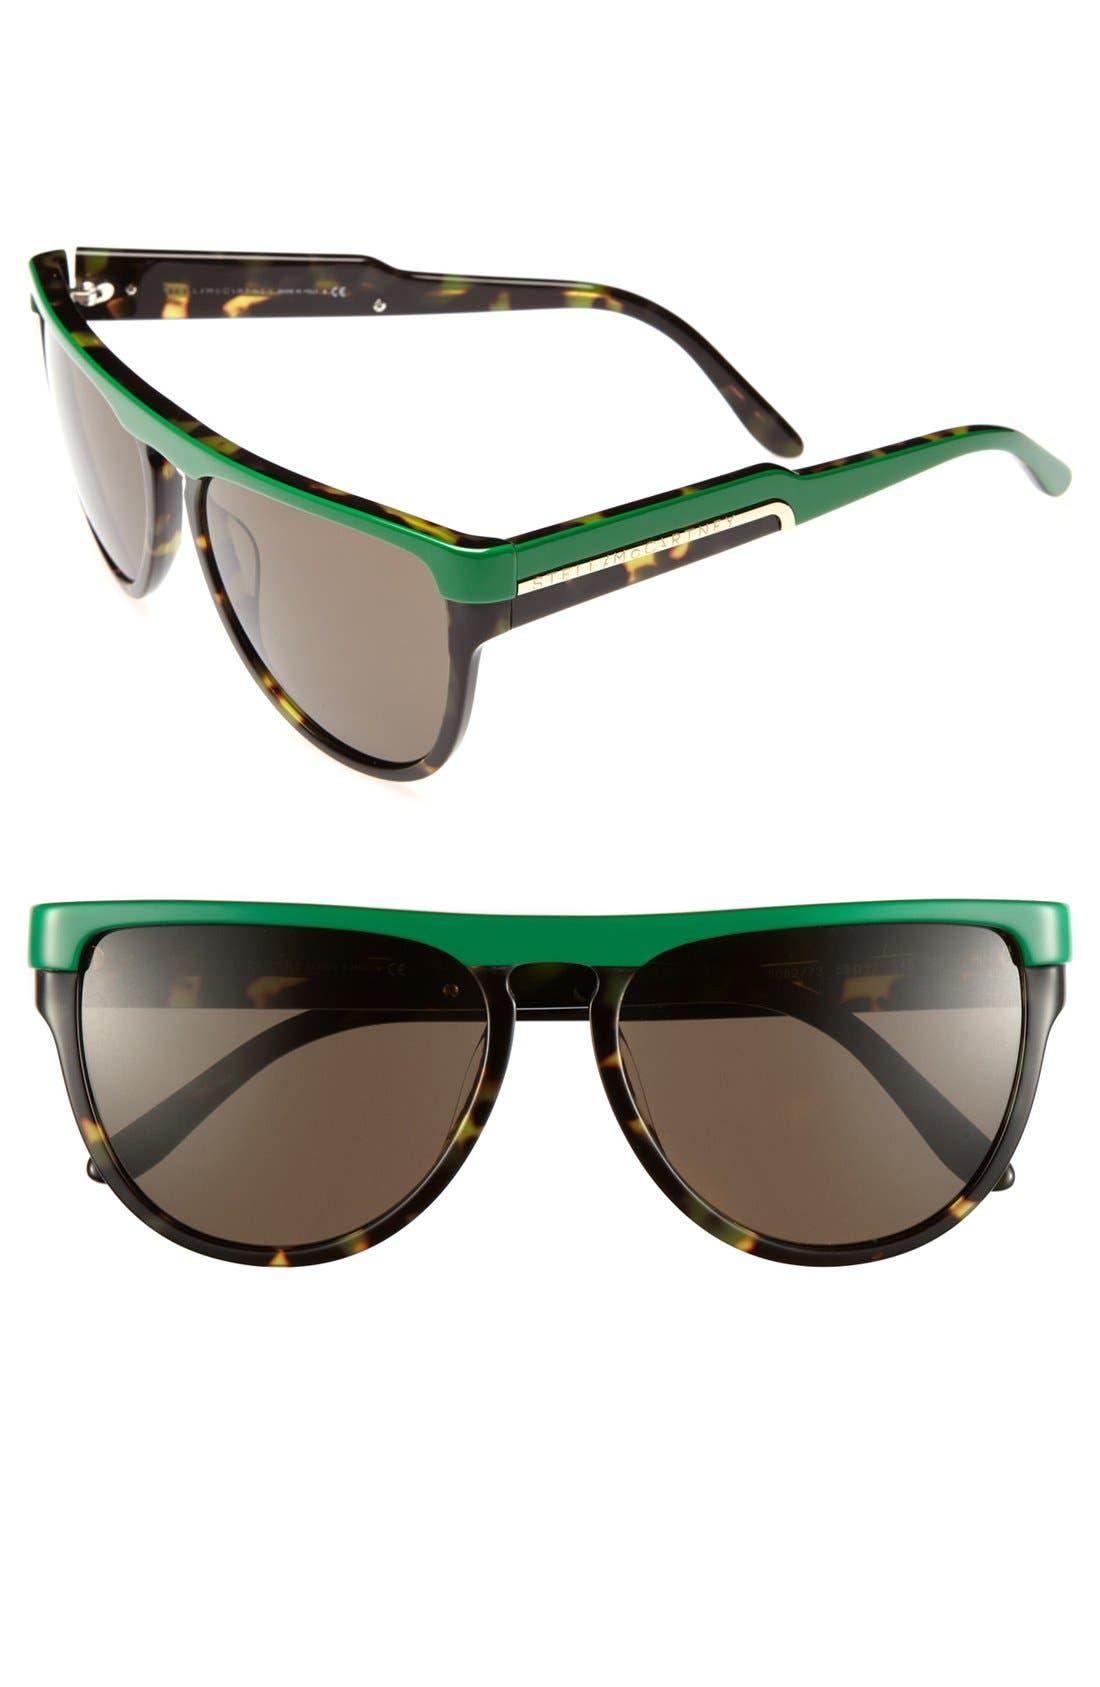 Main Image - Stella McCartney 59mm Sunglasses